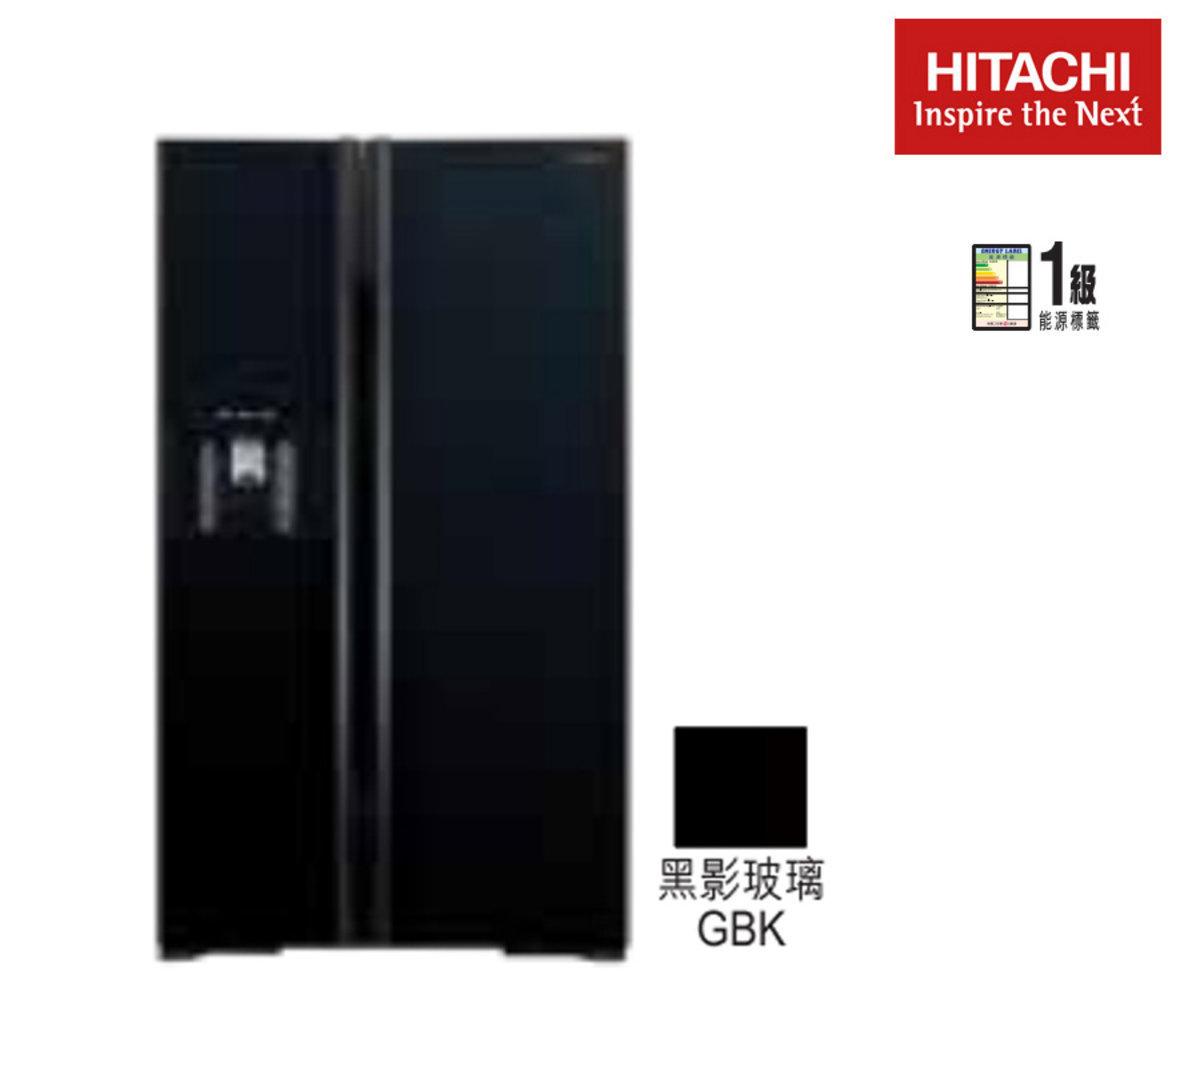 Side-by-side Refrigerator (Glass Black) R-S700GP2HGBK